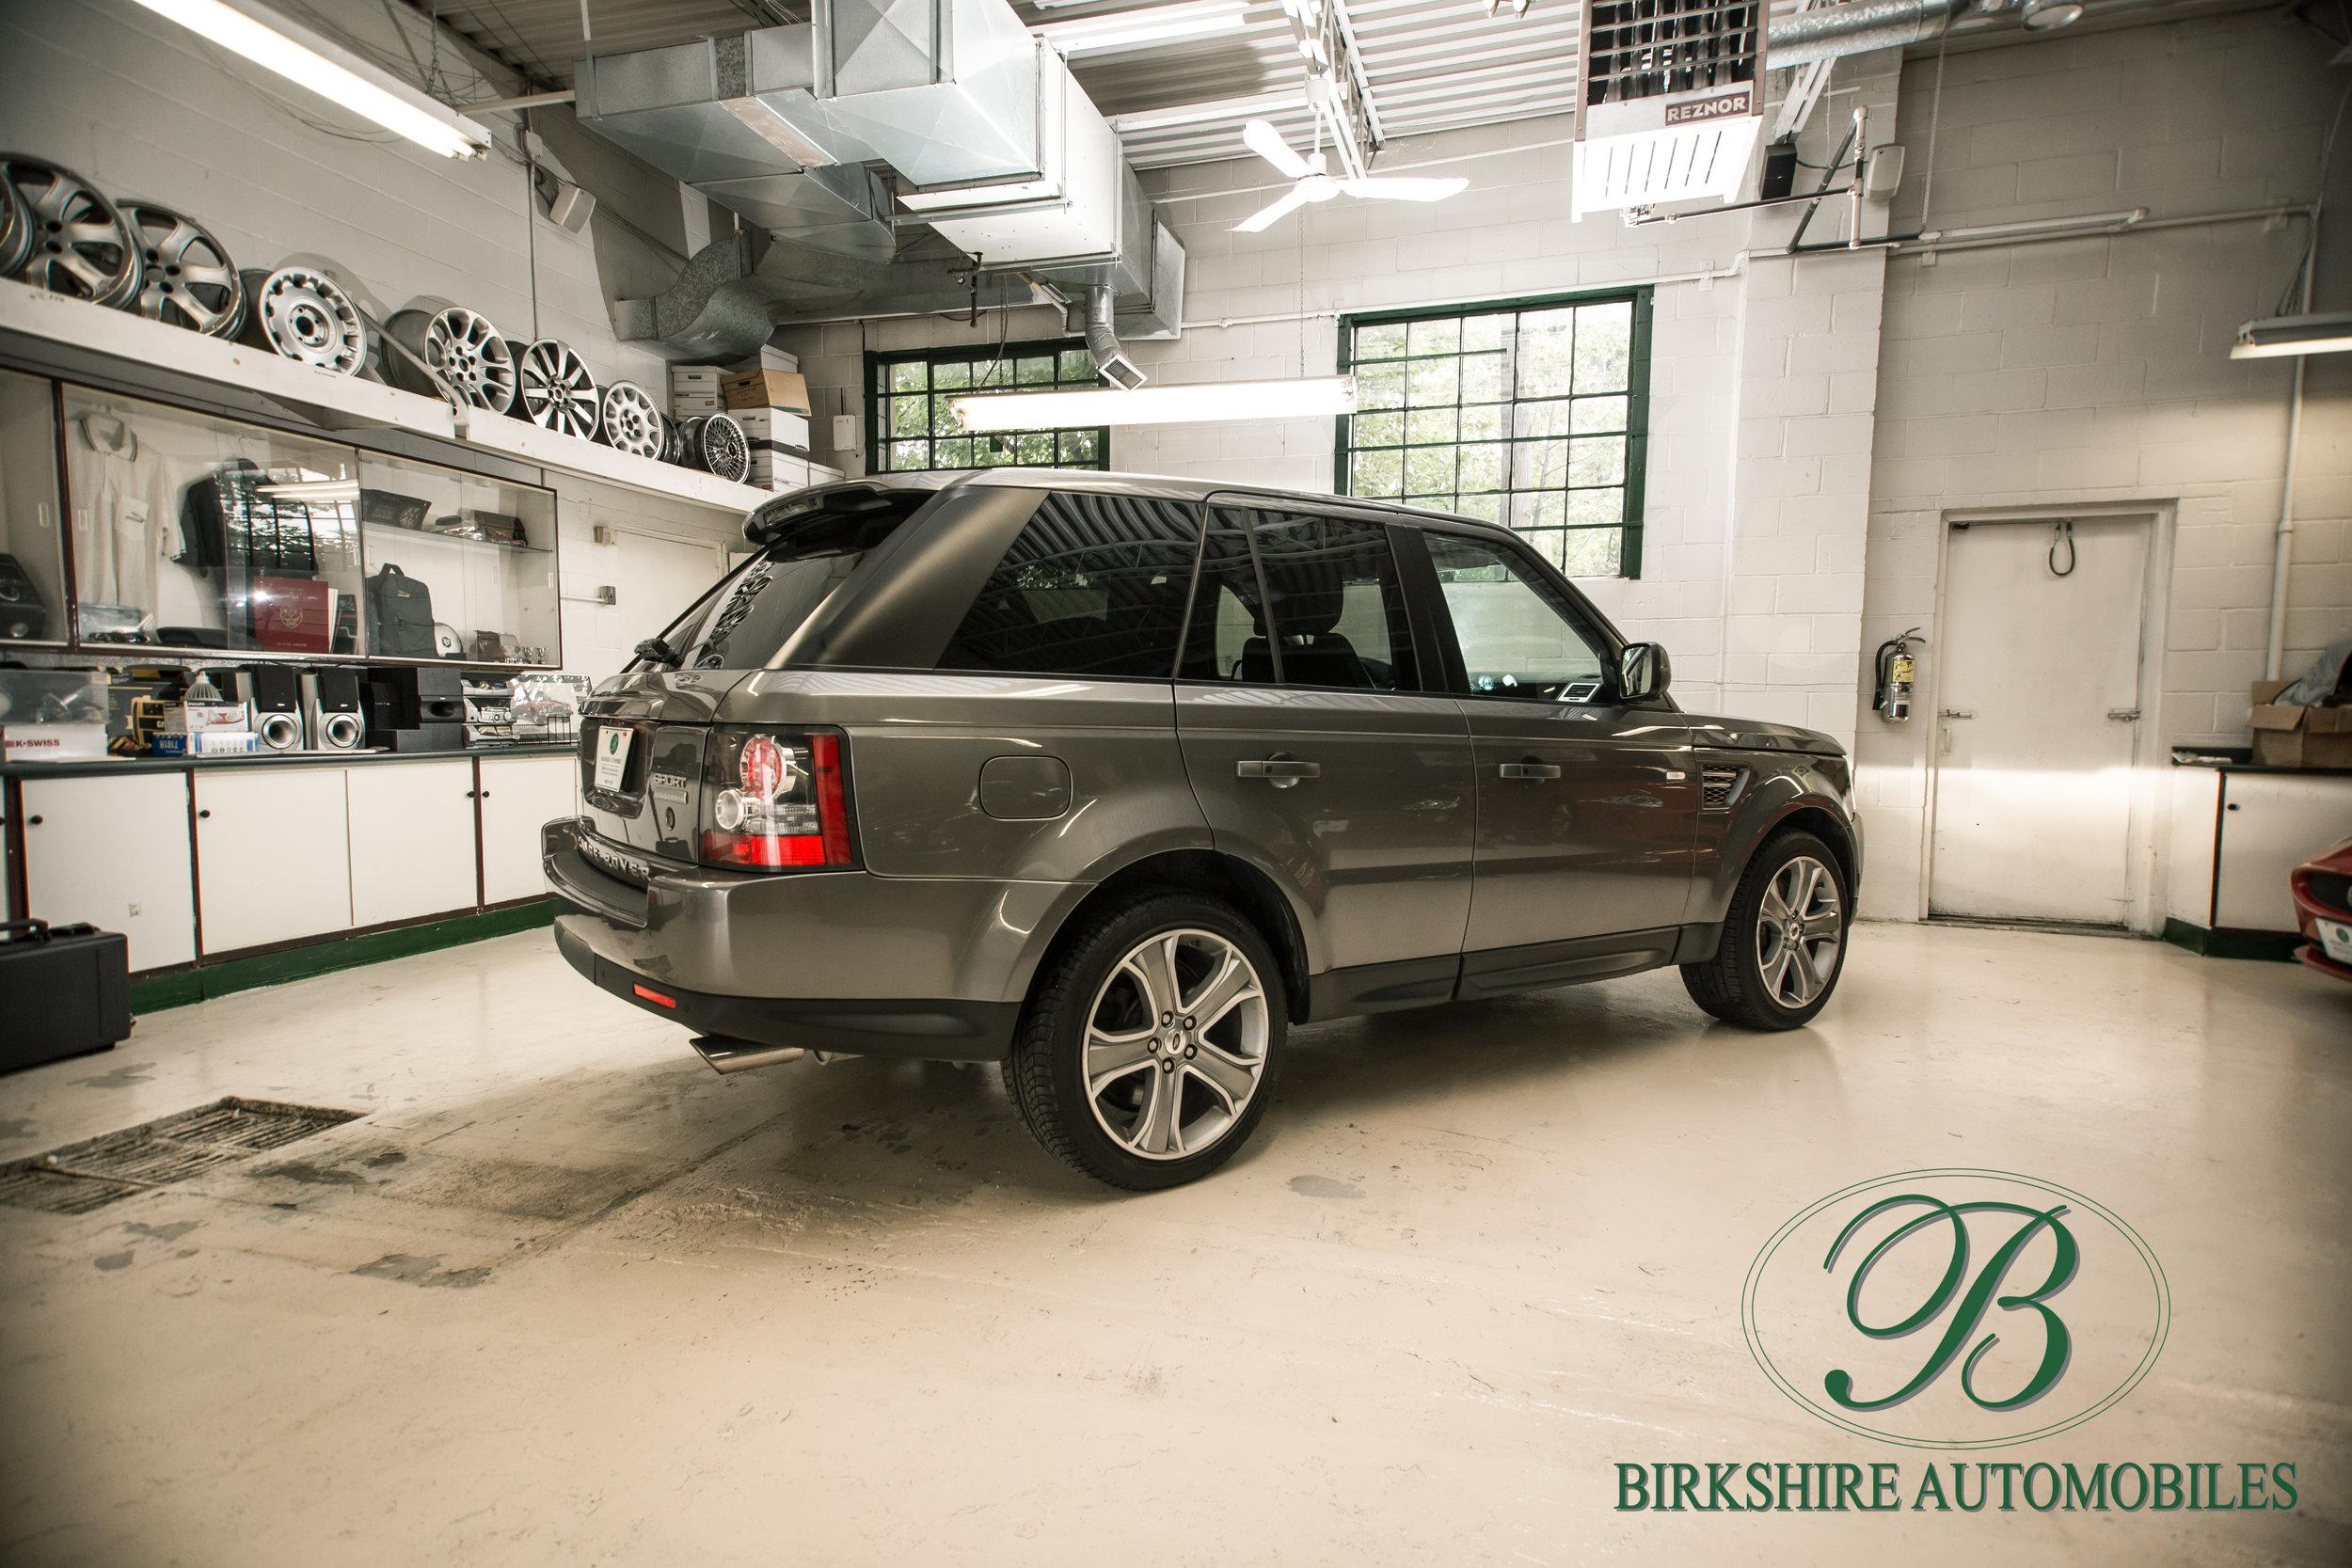 Birkshire Automobiles-25.jpg